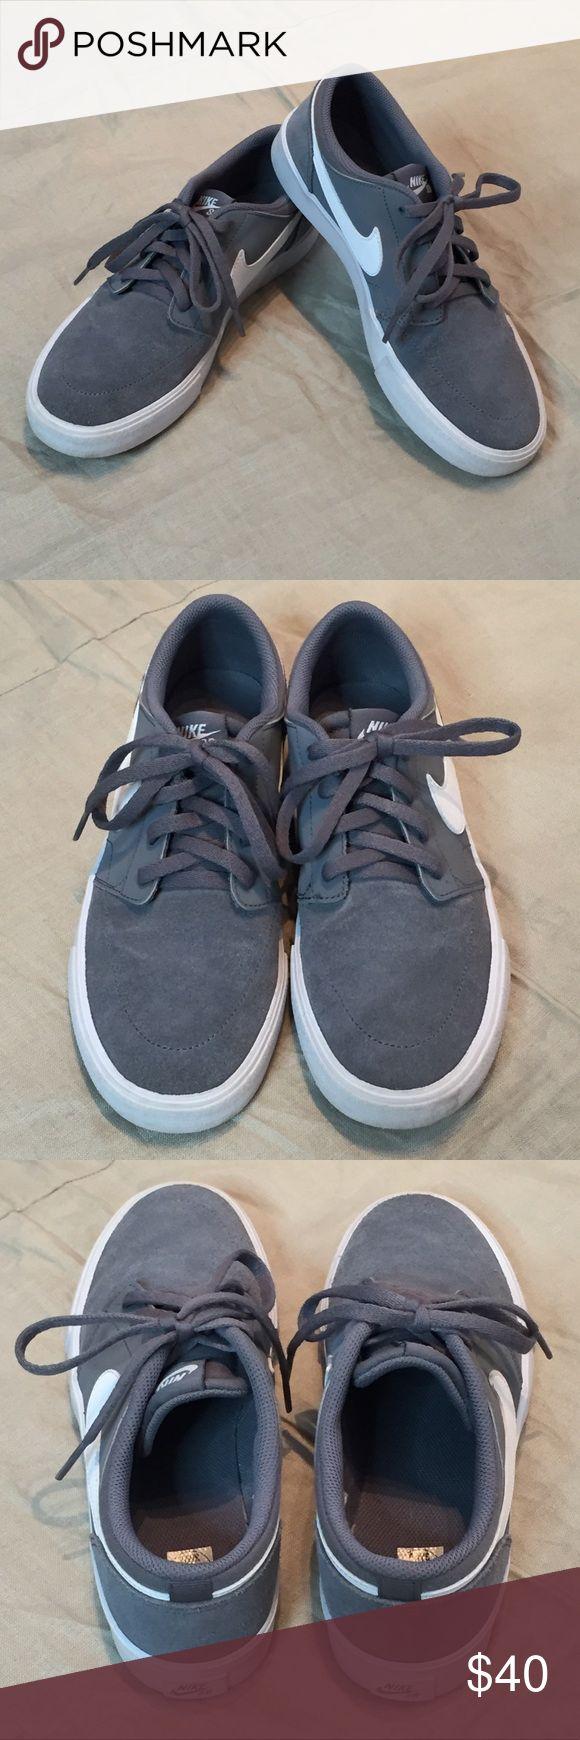 NIKE SB Portmore gray suede skate shoes sneakers 5 NEW boy's Nike SB Portmore gray suede skate shoes. Size 5 YOUTH. Nike Shoes Sneakers